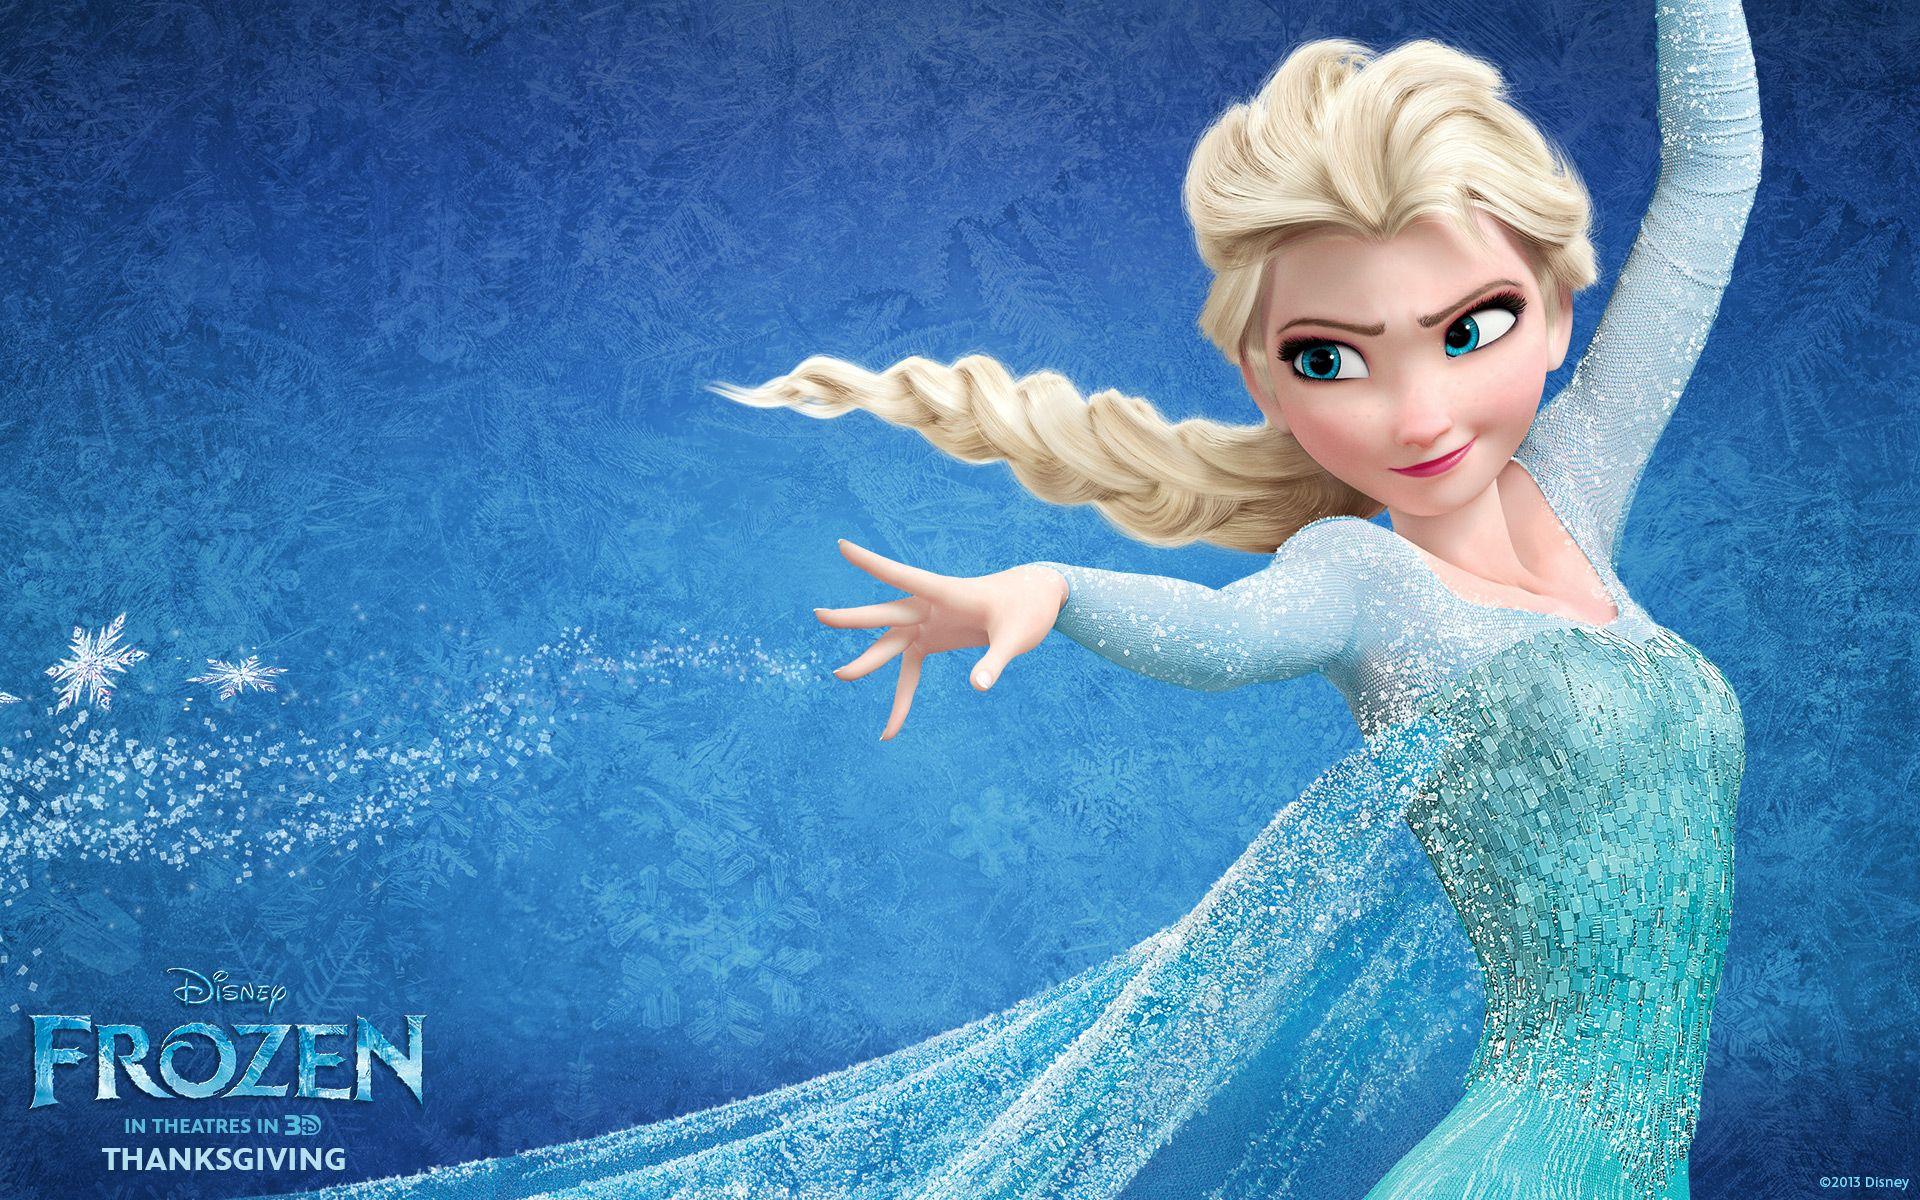 Heroines of Frozen Melt my Bitter Heart // Reel Girl Blog | Phim frozen, Phim  hoạt hình, Frozen disney